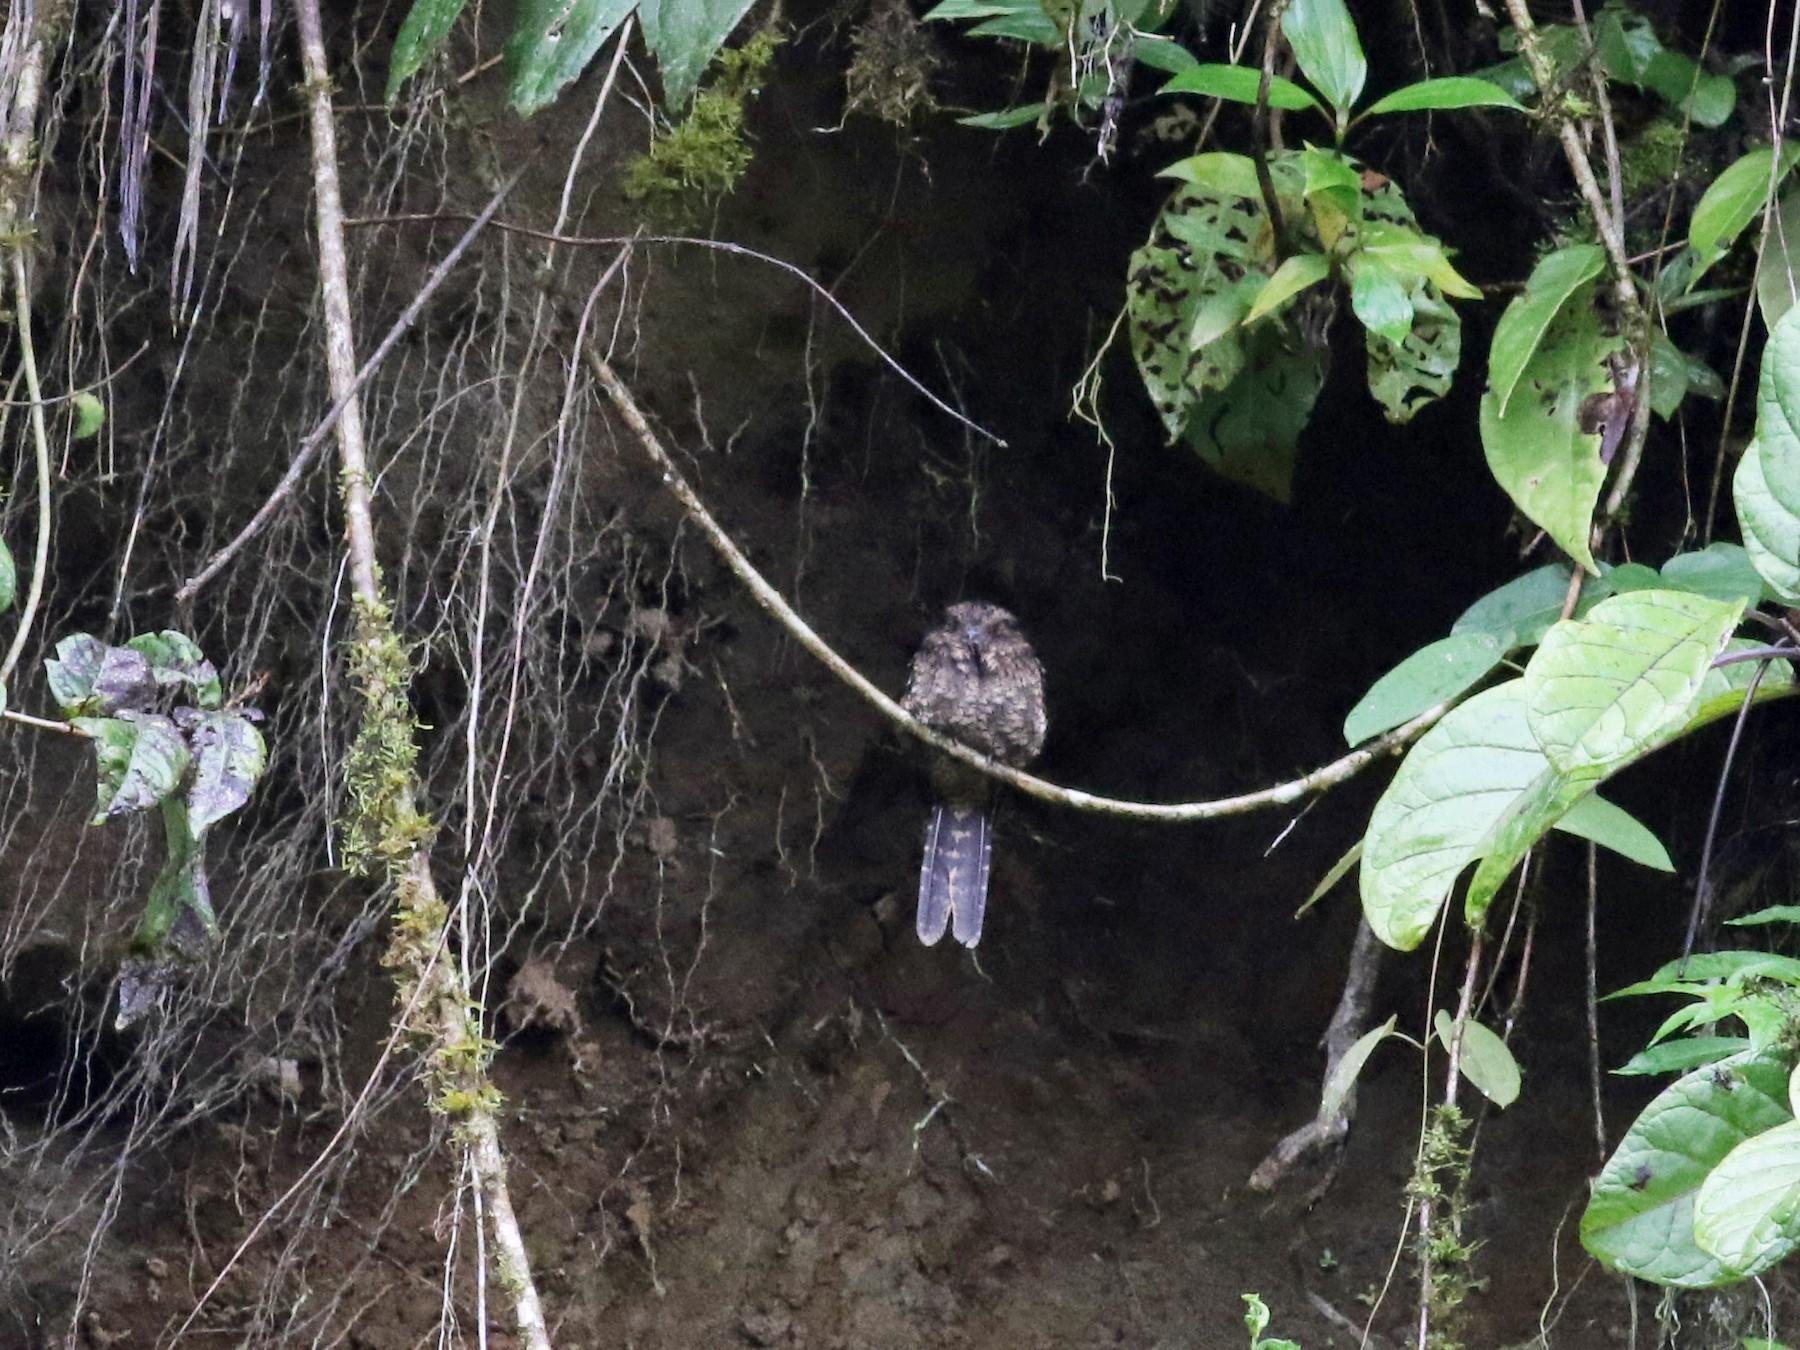 Lyre-tailed Nightjar - Jay McGowan